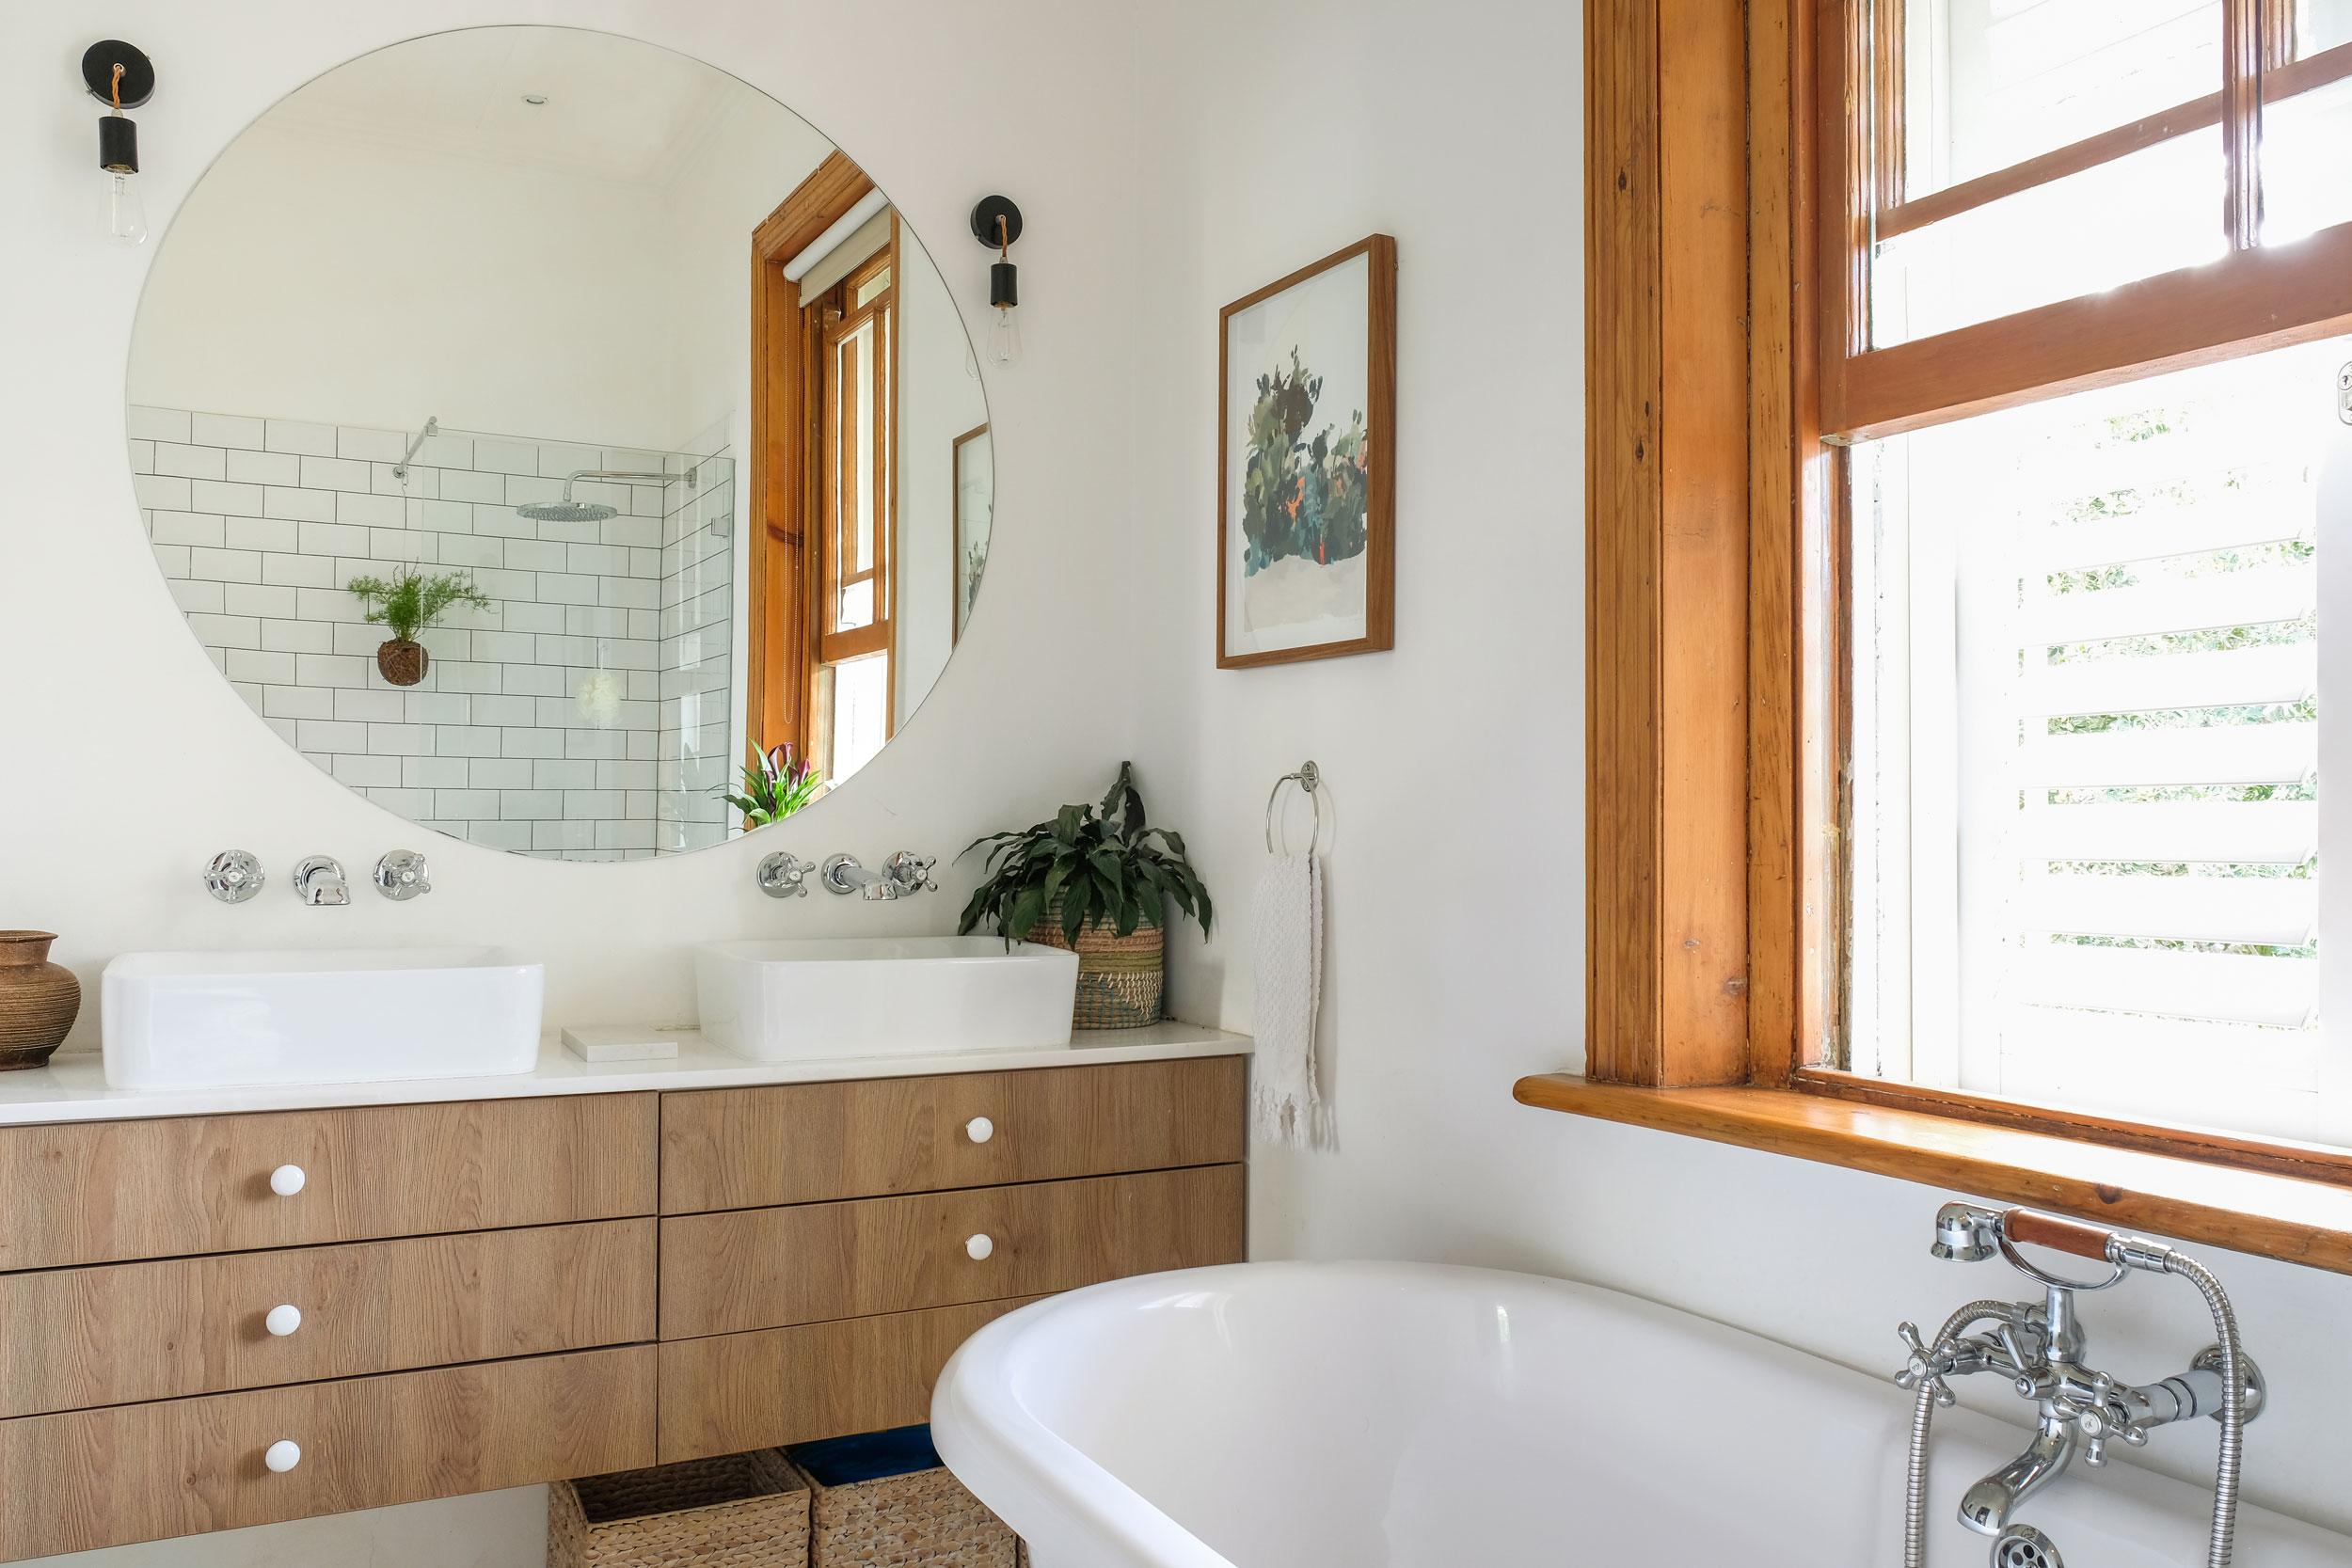 Bathroom Vanity Lighting Ideas And Design Tips Apartment regarding dimensions 2500 X 1667